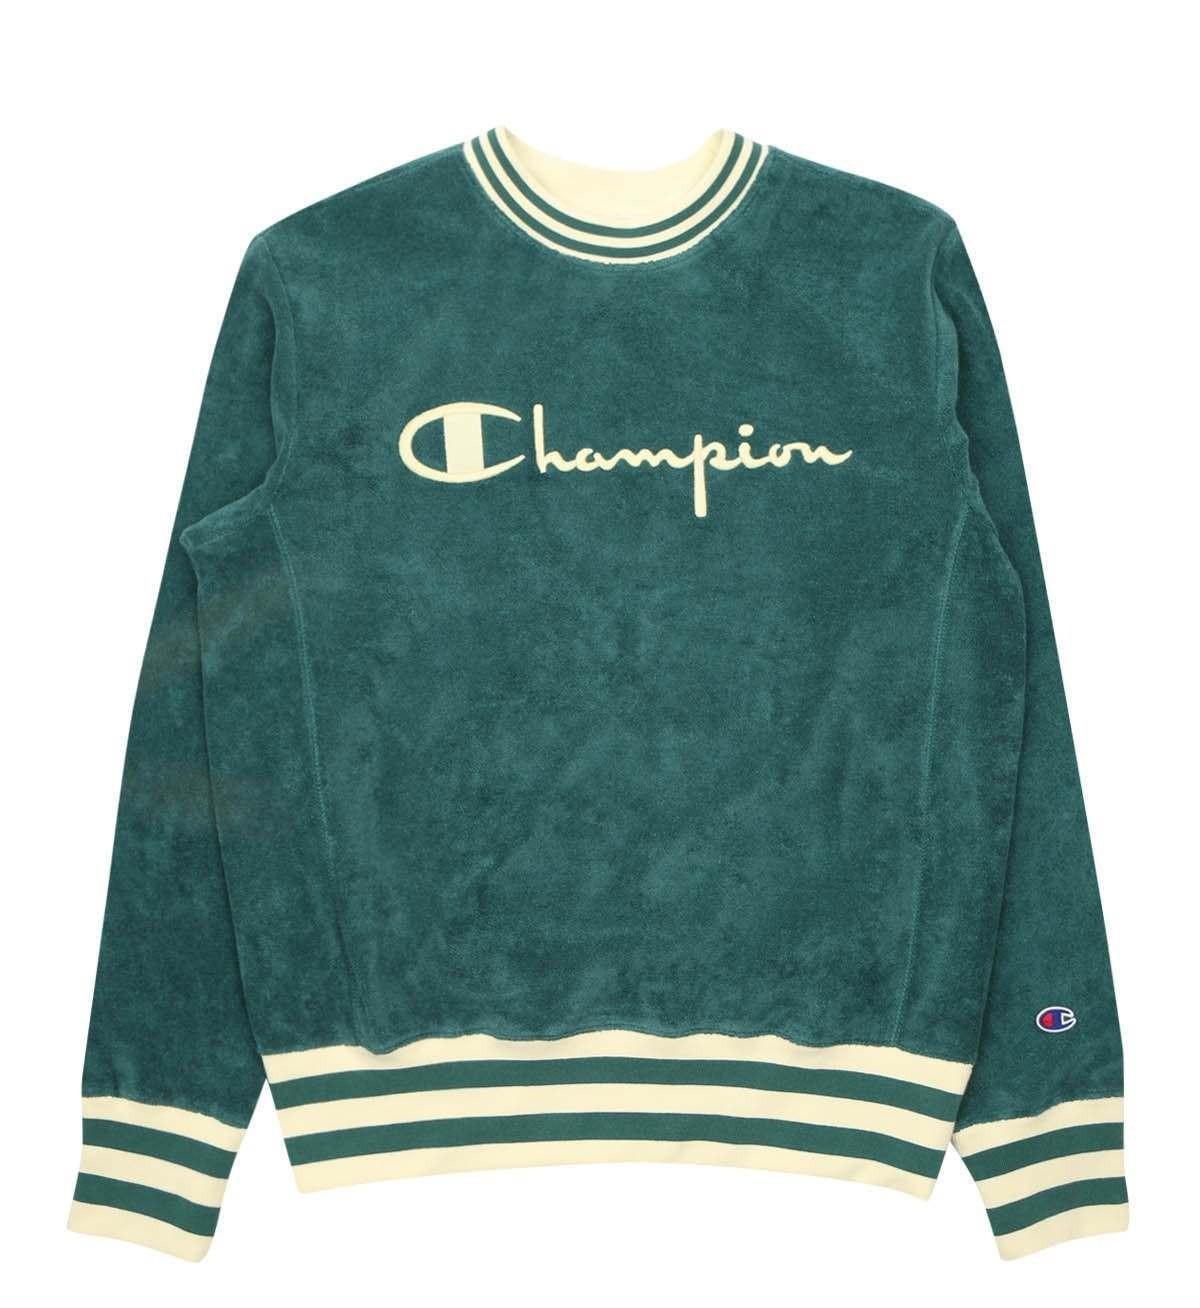 sweater green cream champion stripes vintage vintagesweater